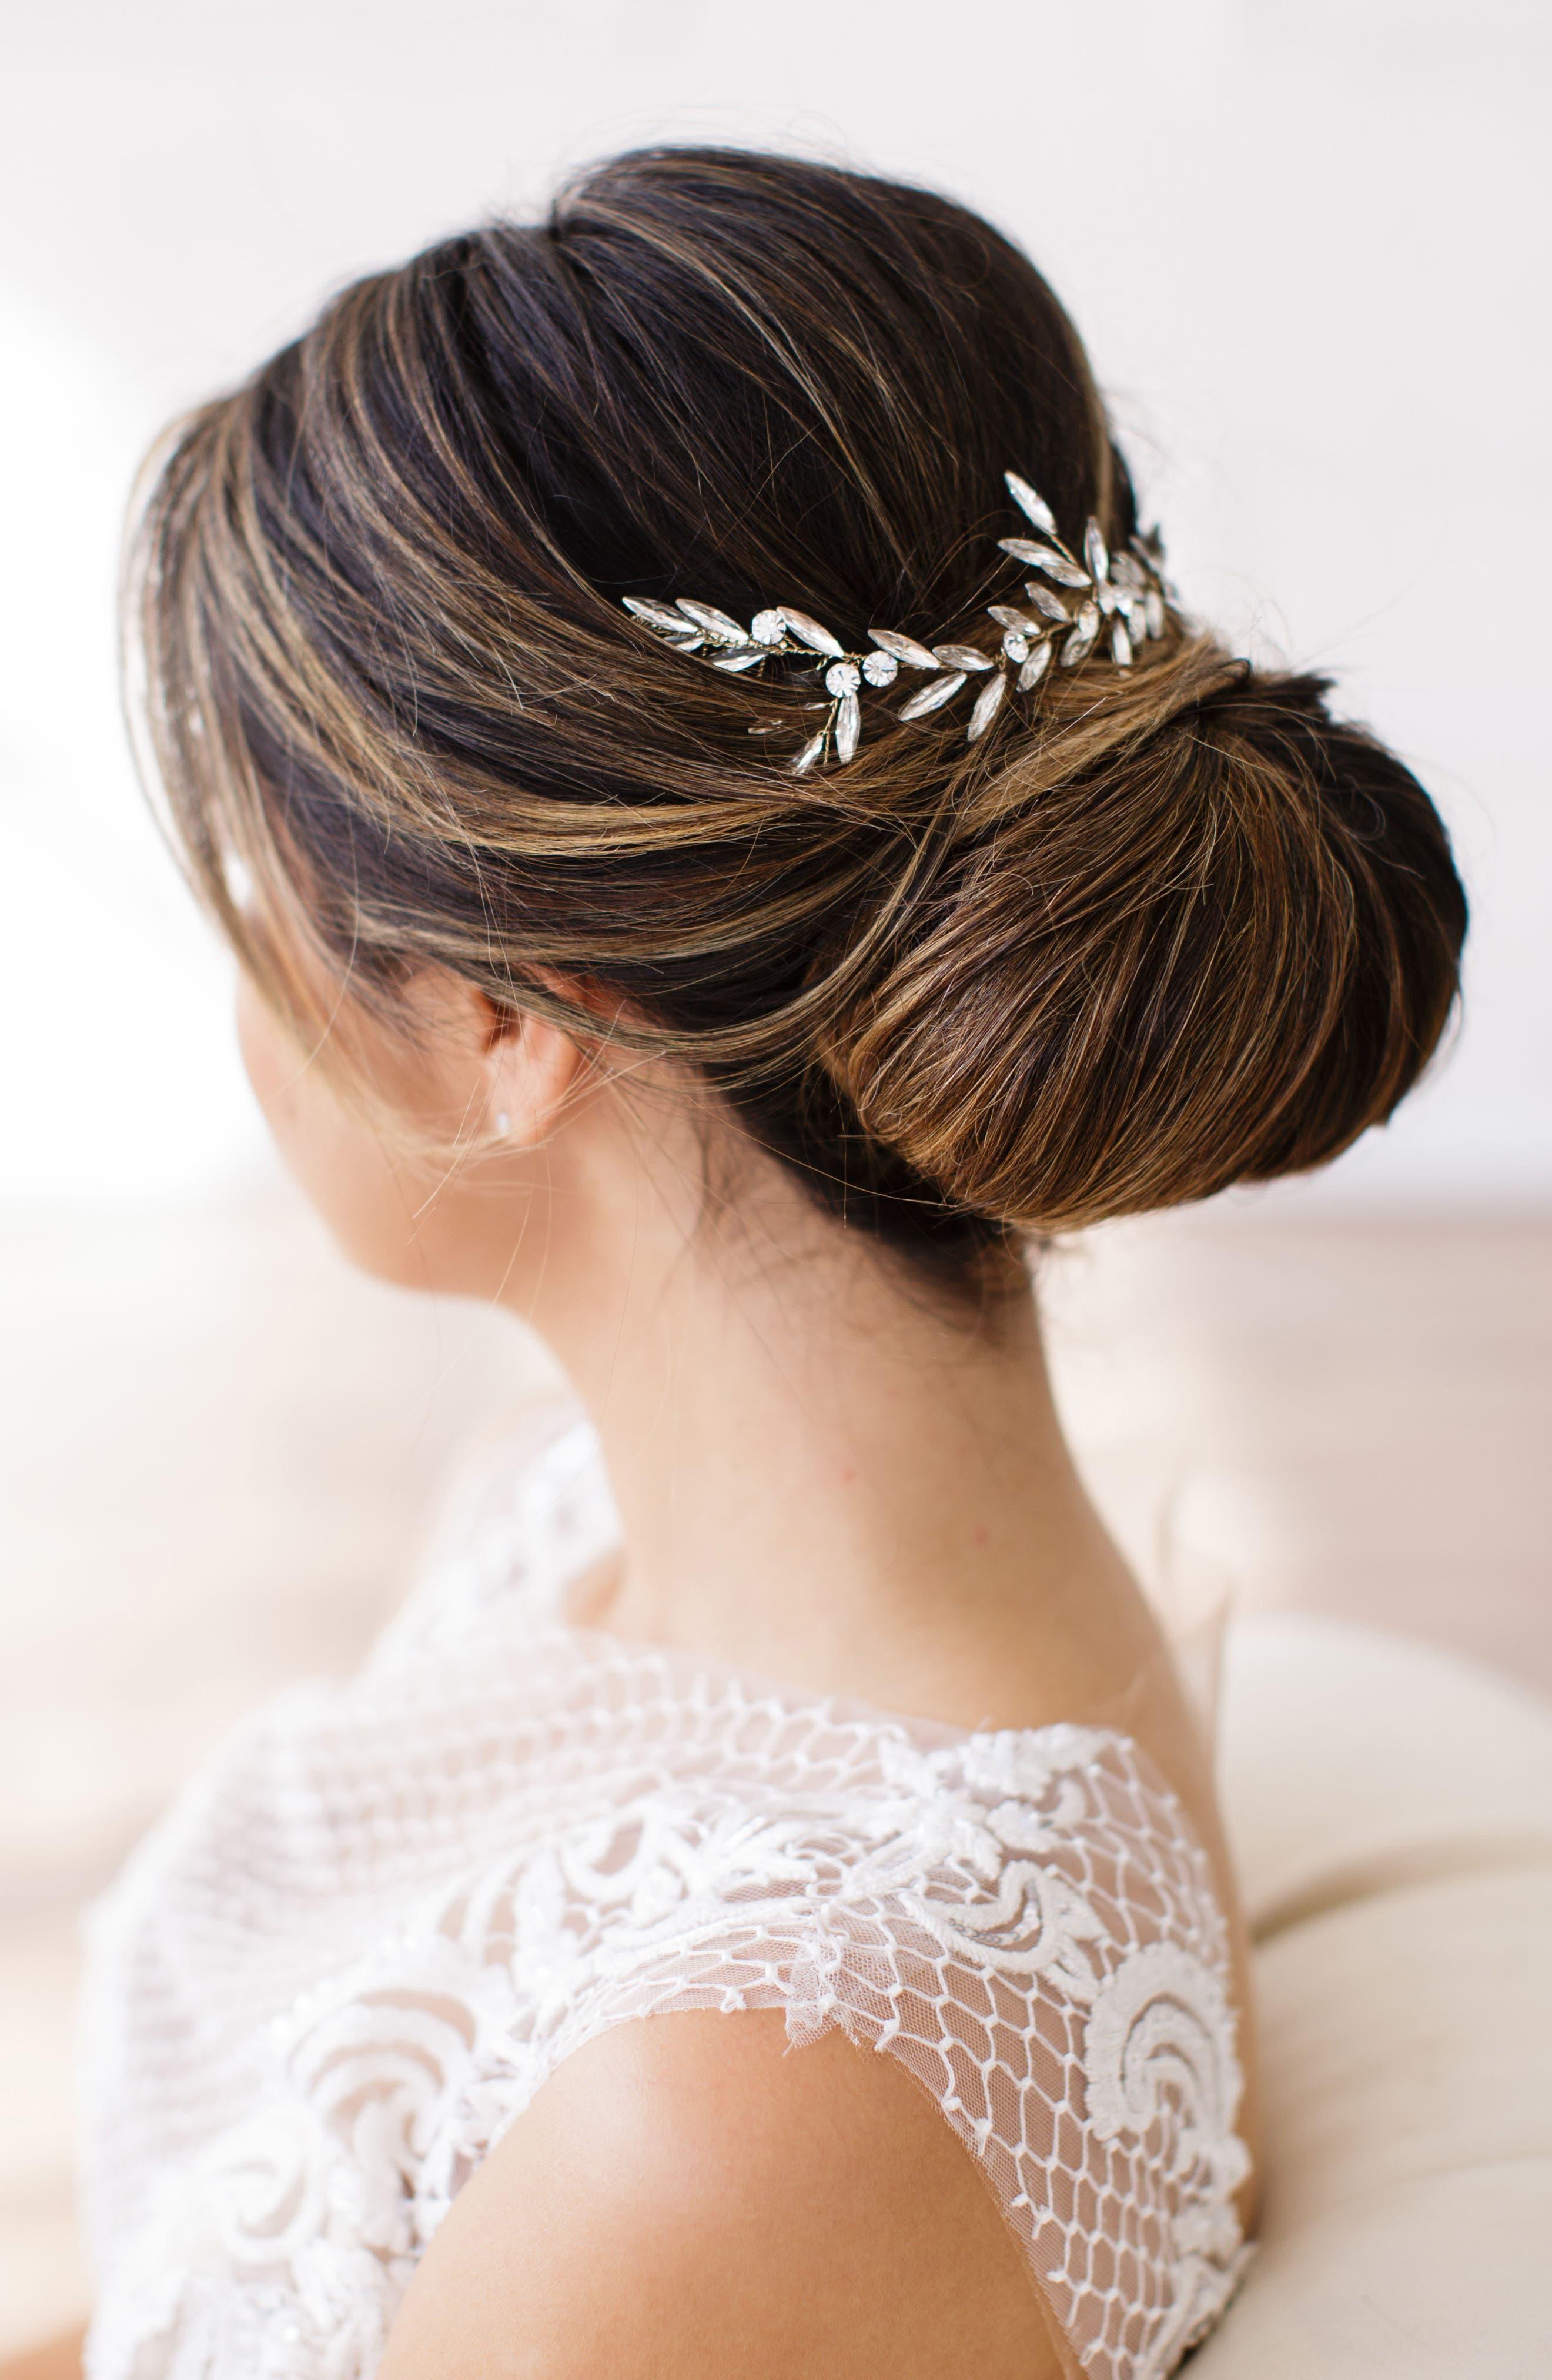 Alternate Image 1 Selected - Brides & Hairpins Blanca Crystal Headpiece